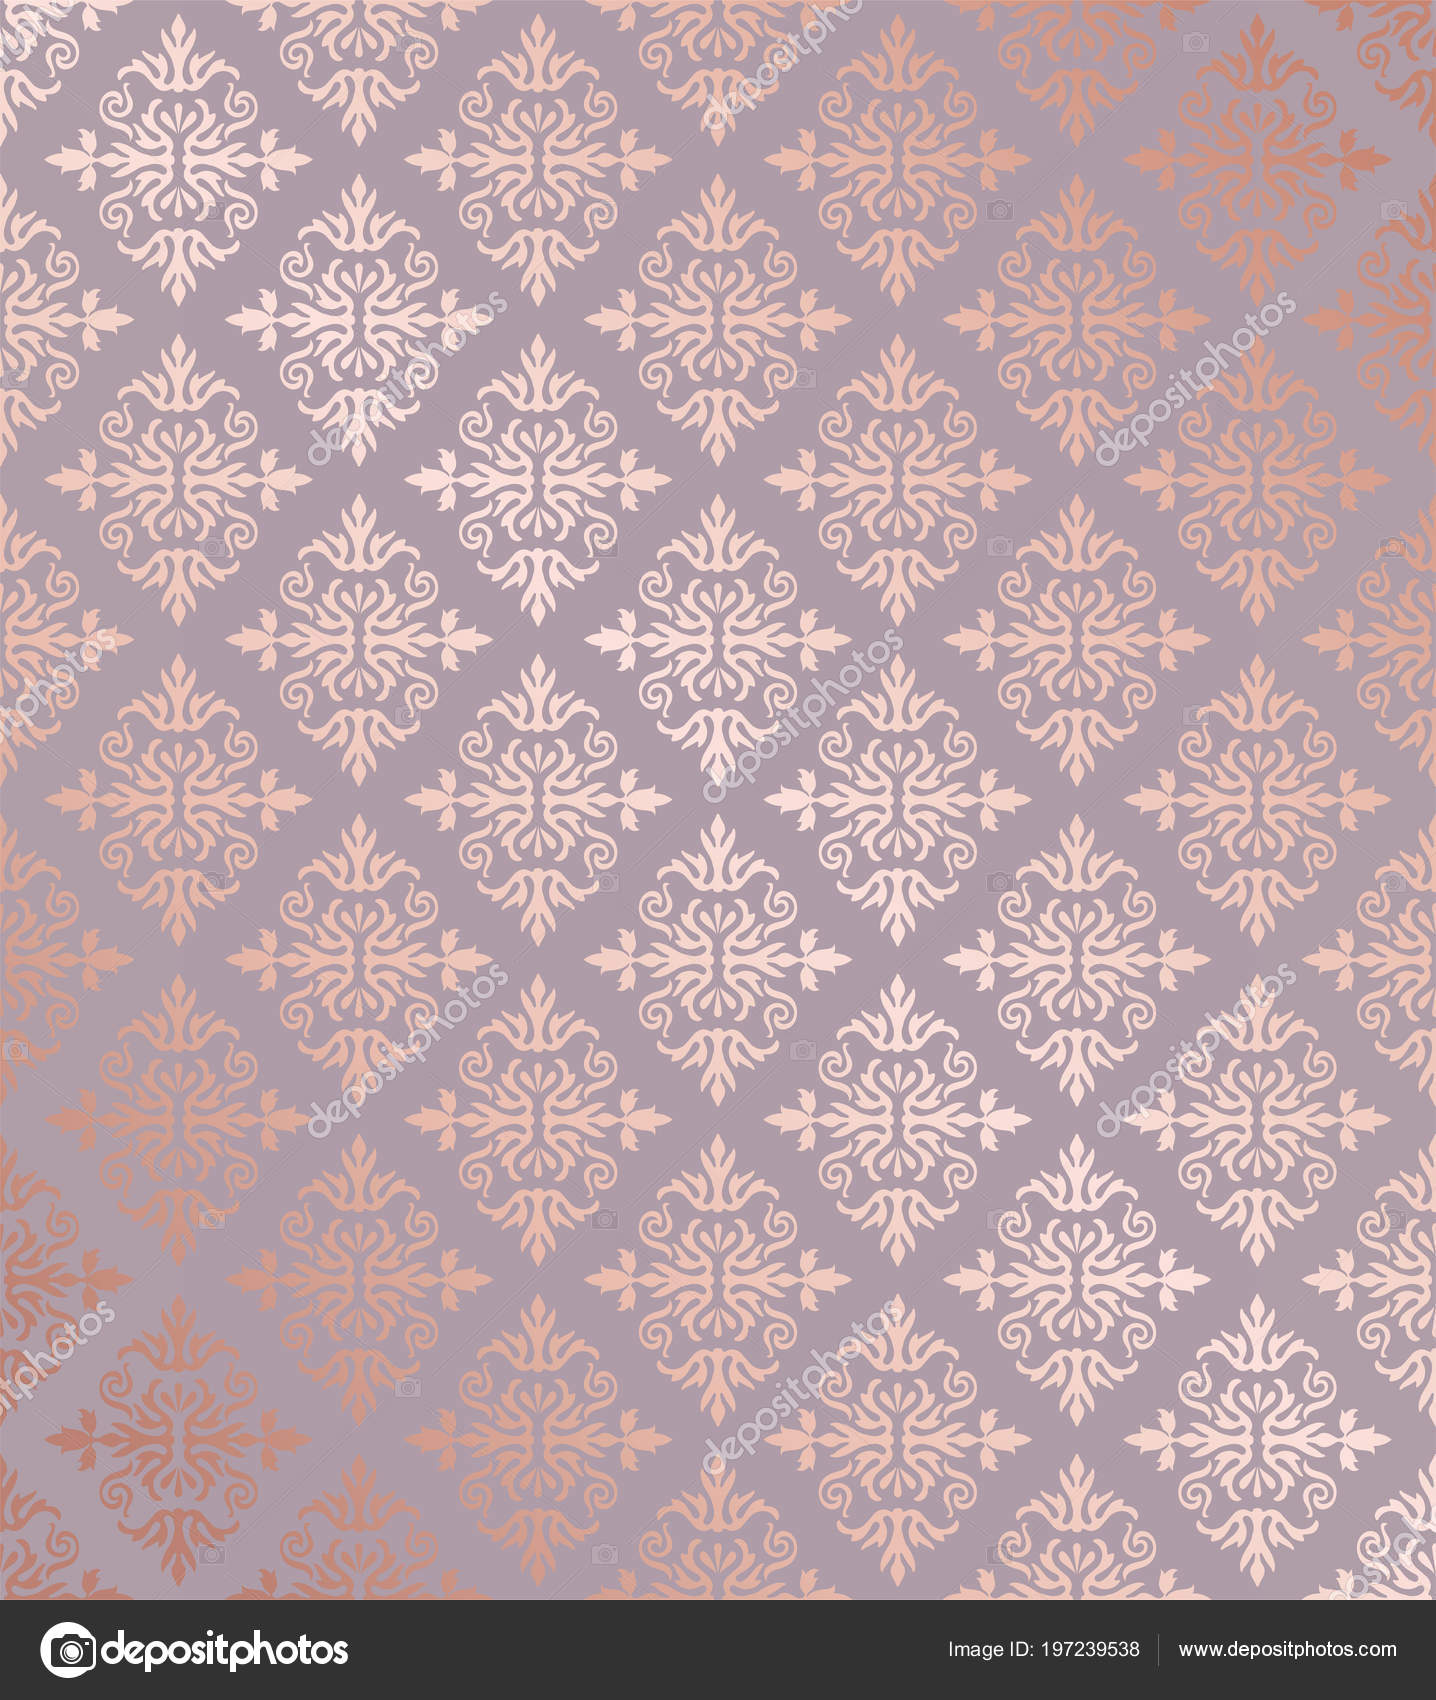 Seamless Floral Damask Rose Gold Wallpaper Pattern Image Vector